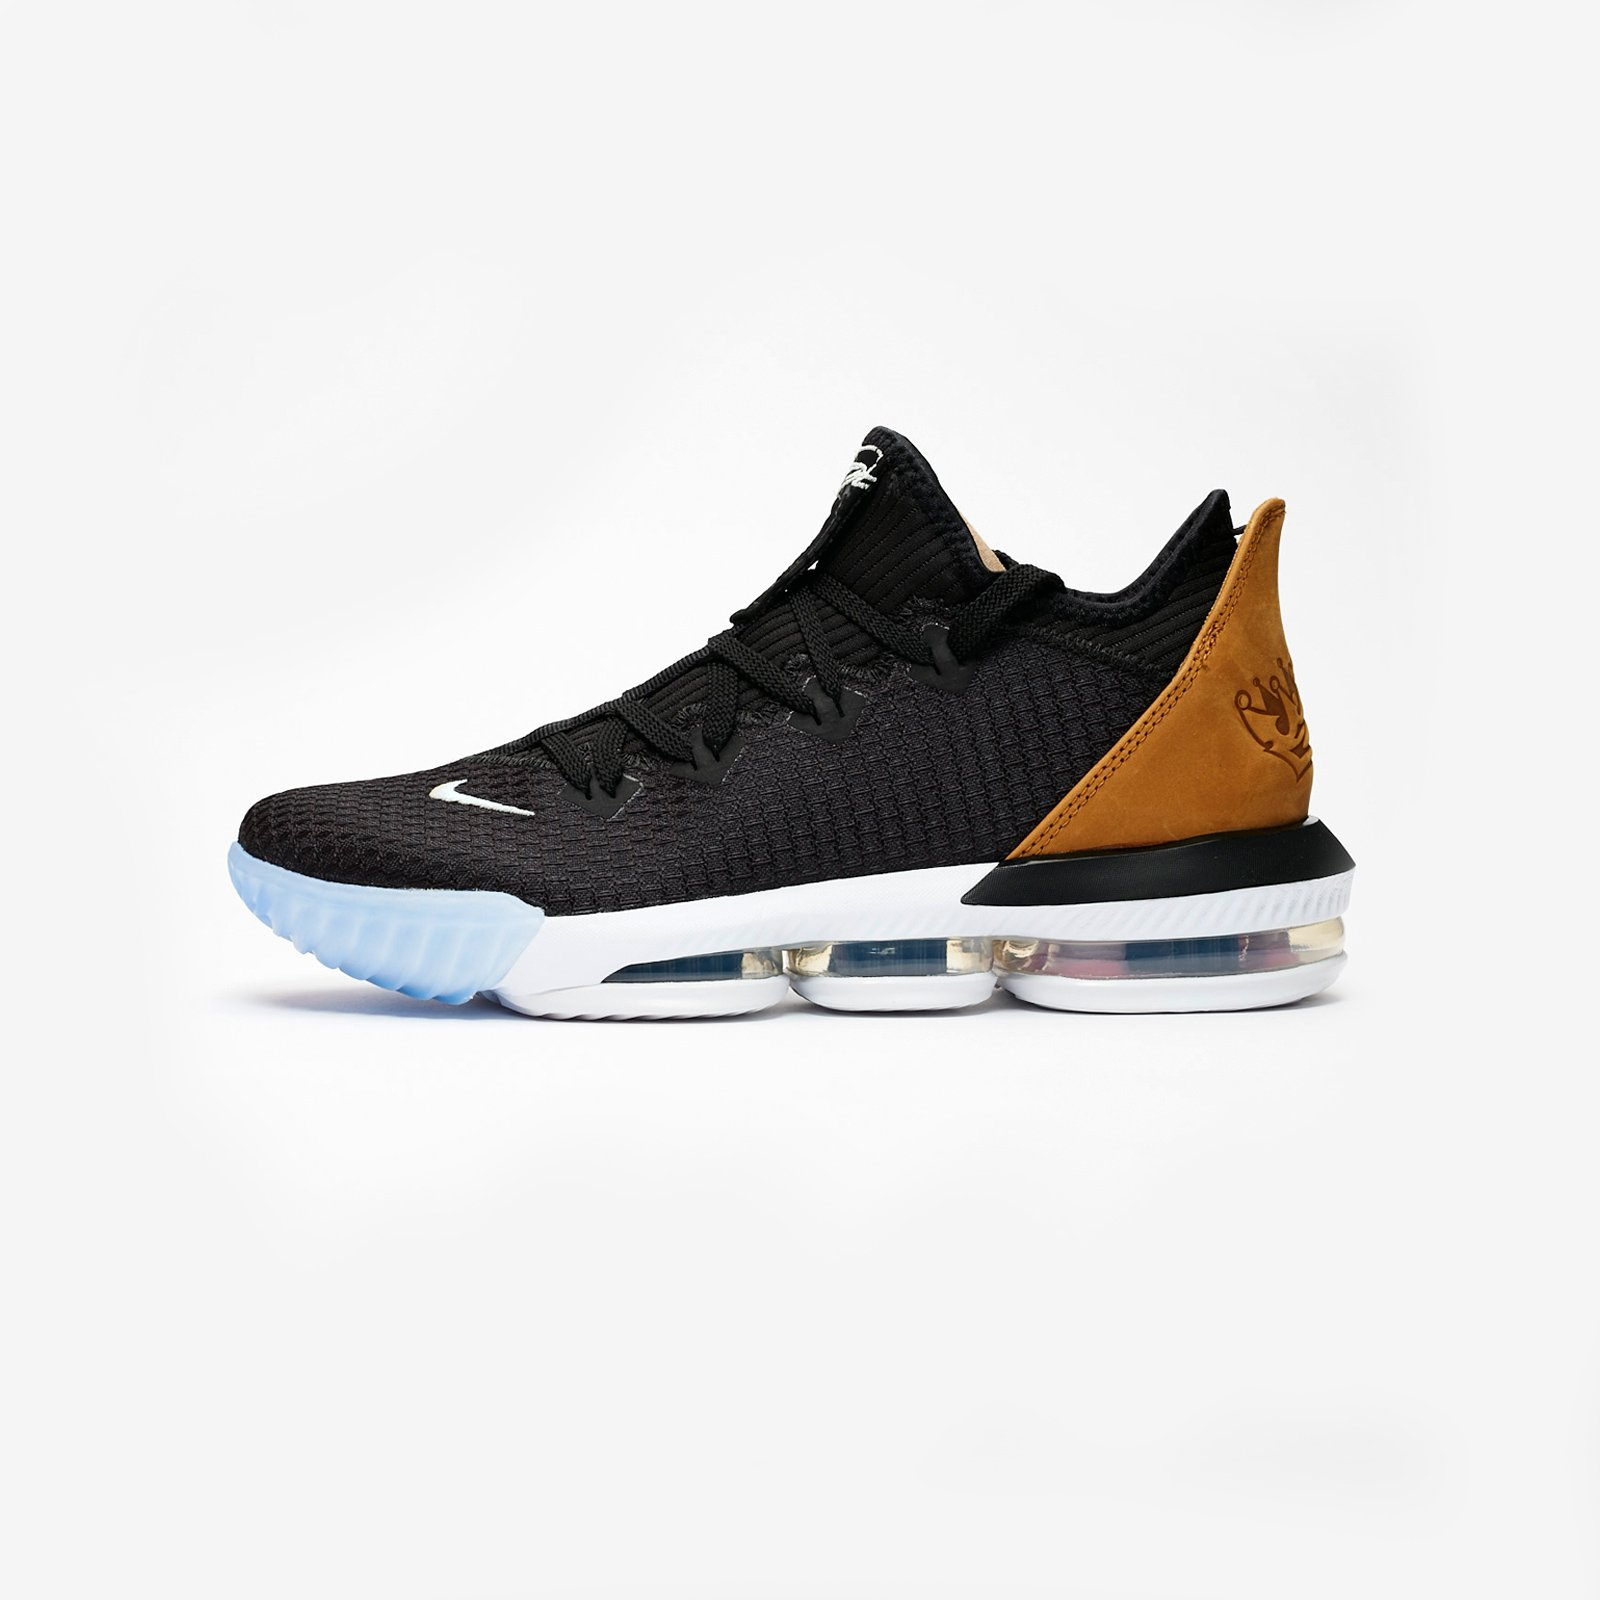 Nike LeBron XVI Low CP - Ci2668-001